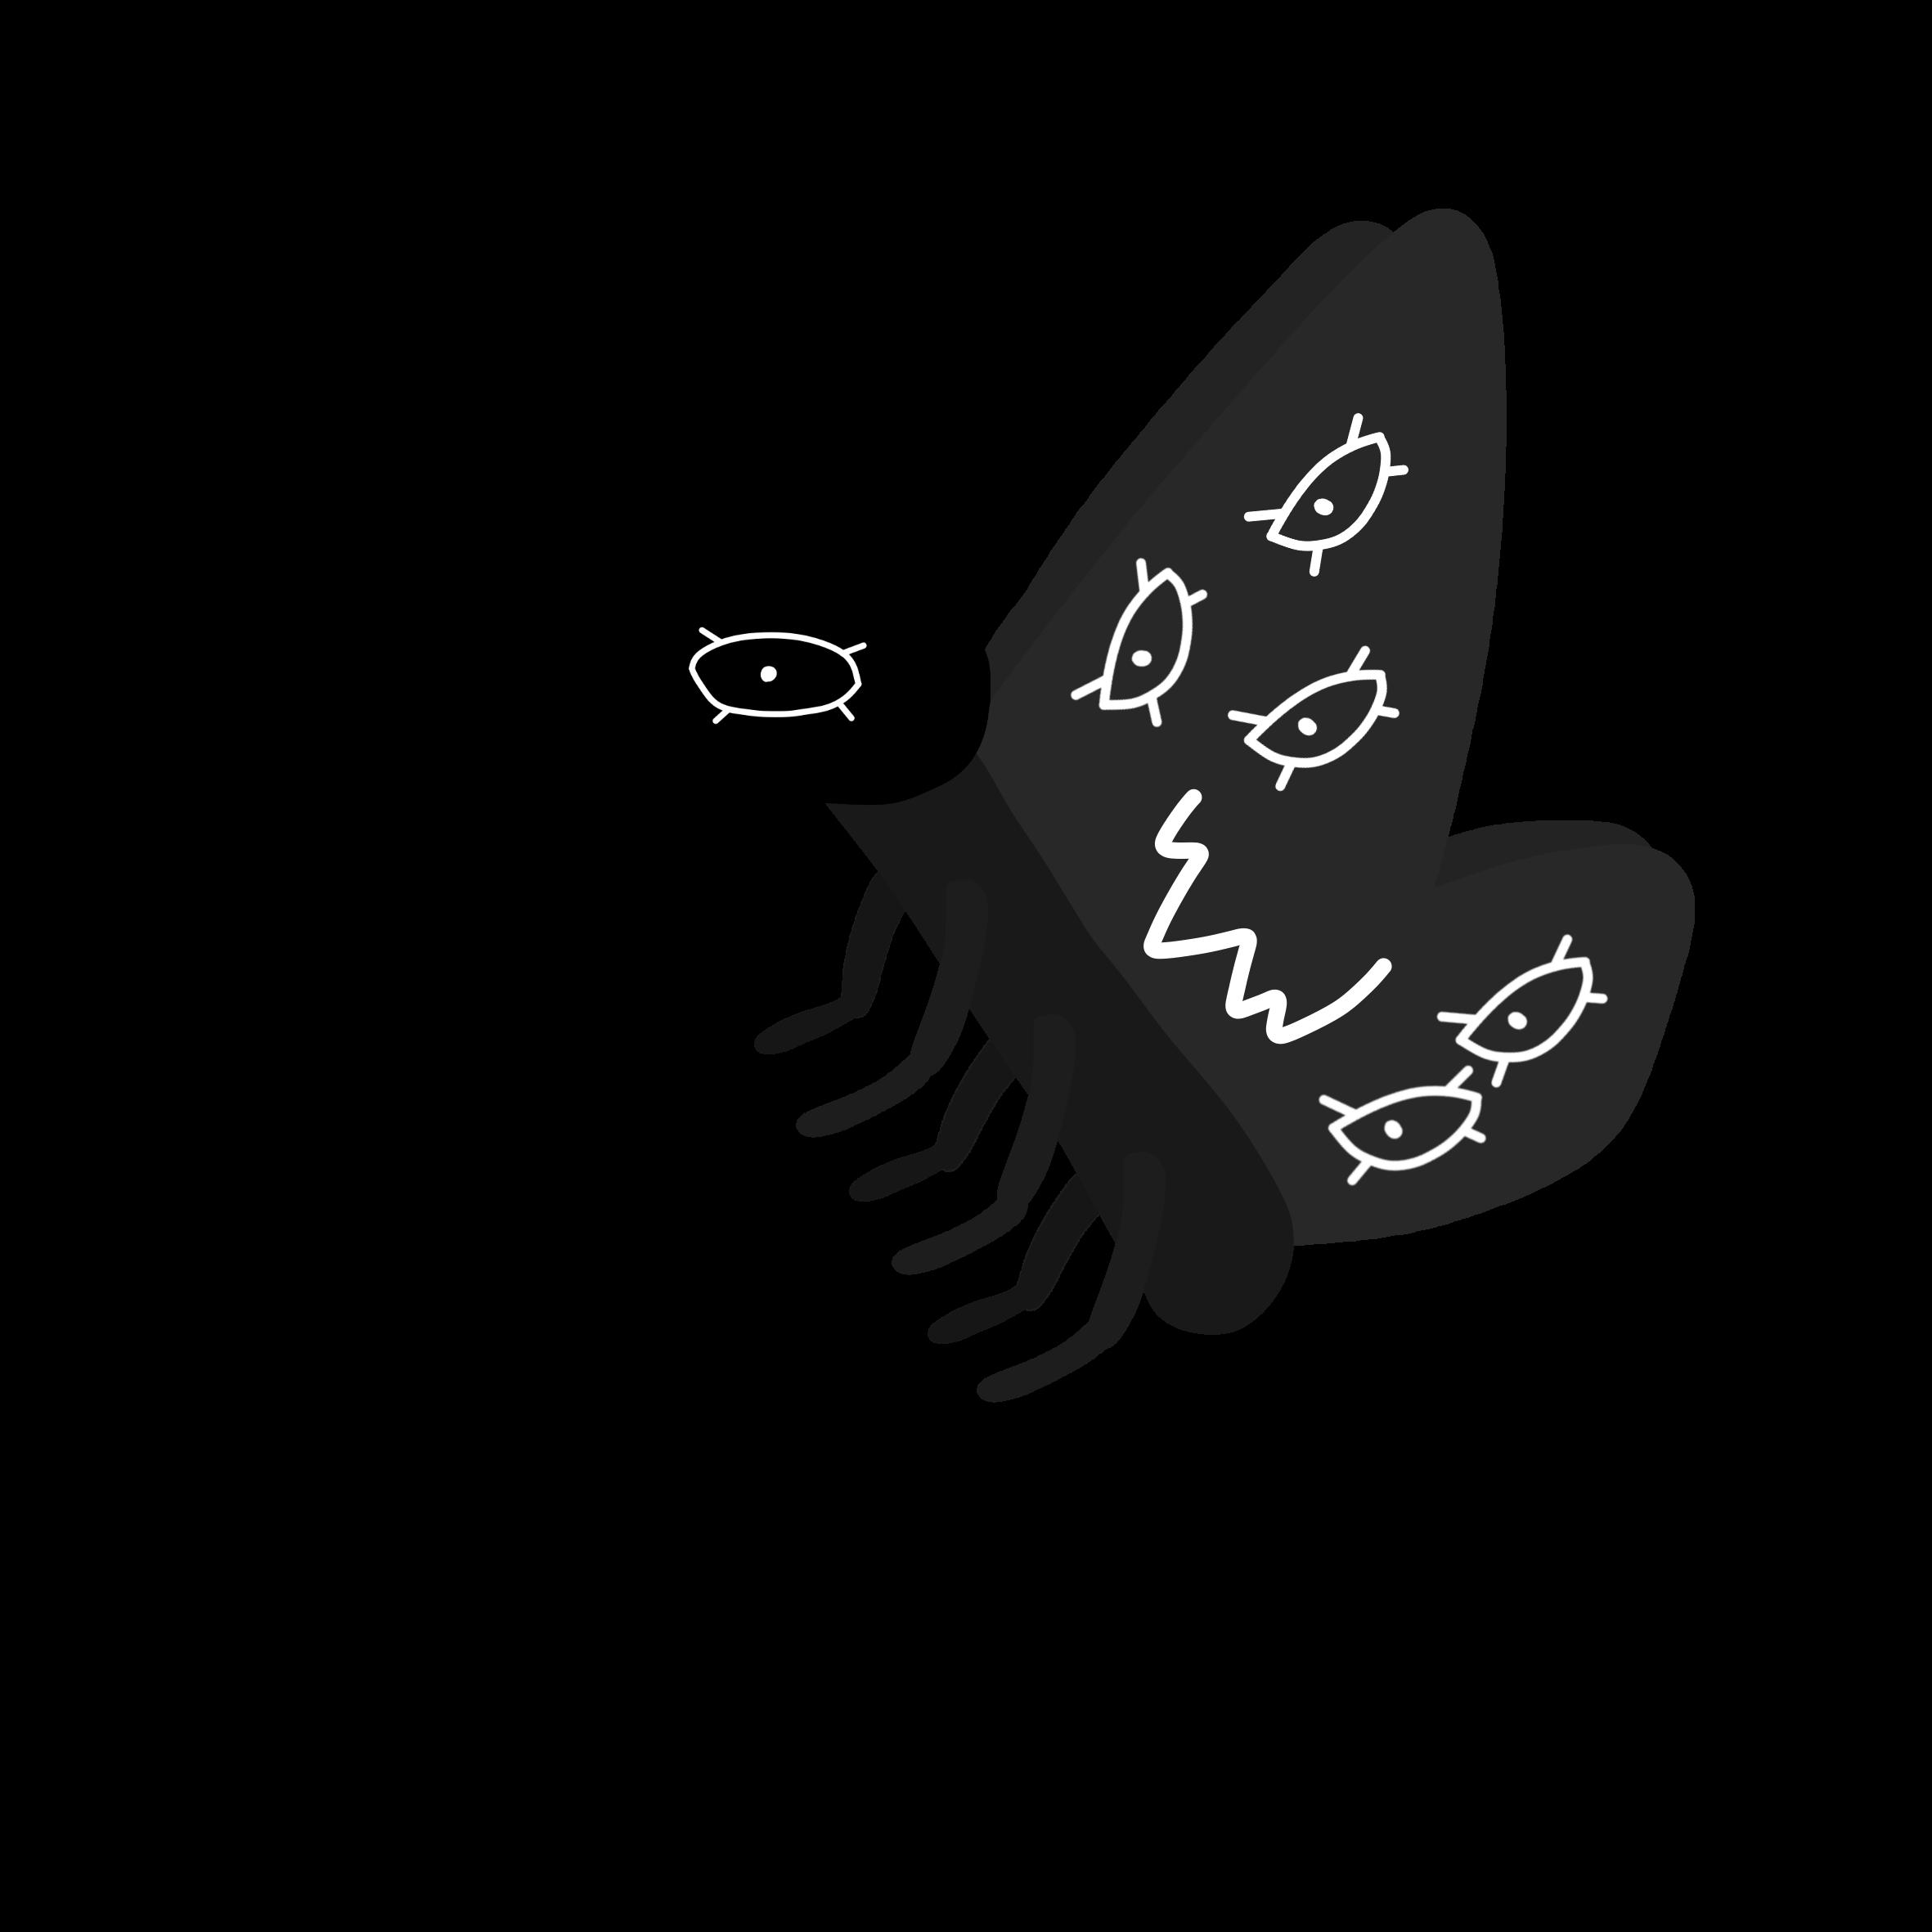 Butterfly abomination lololol